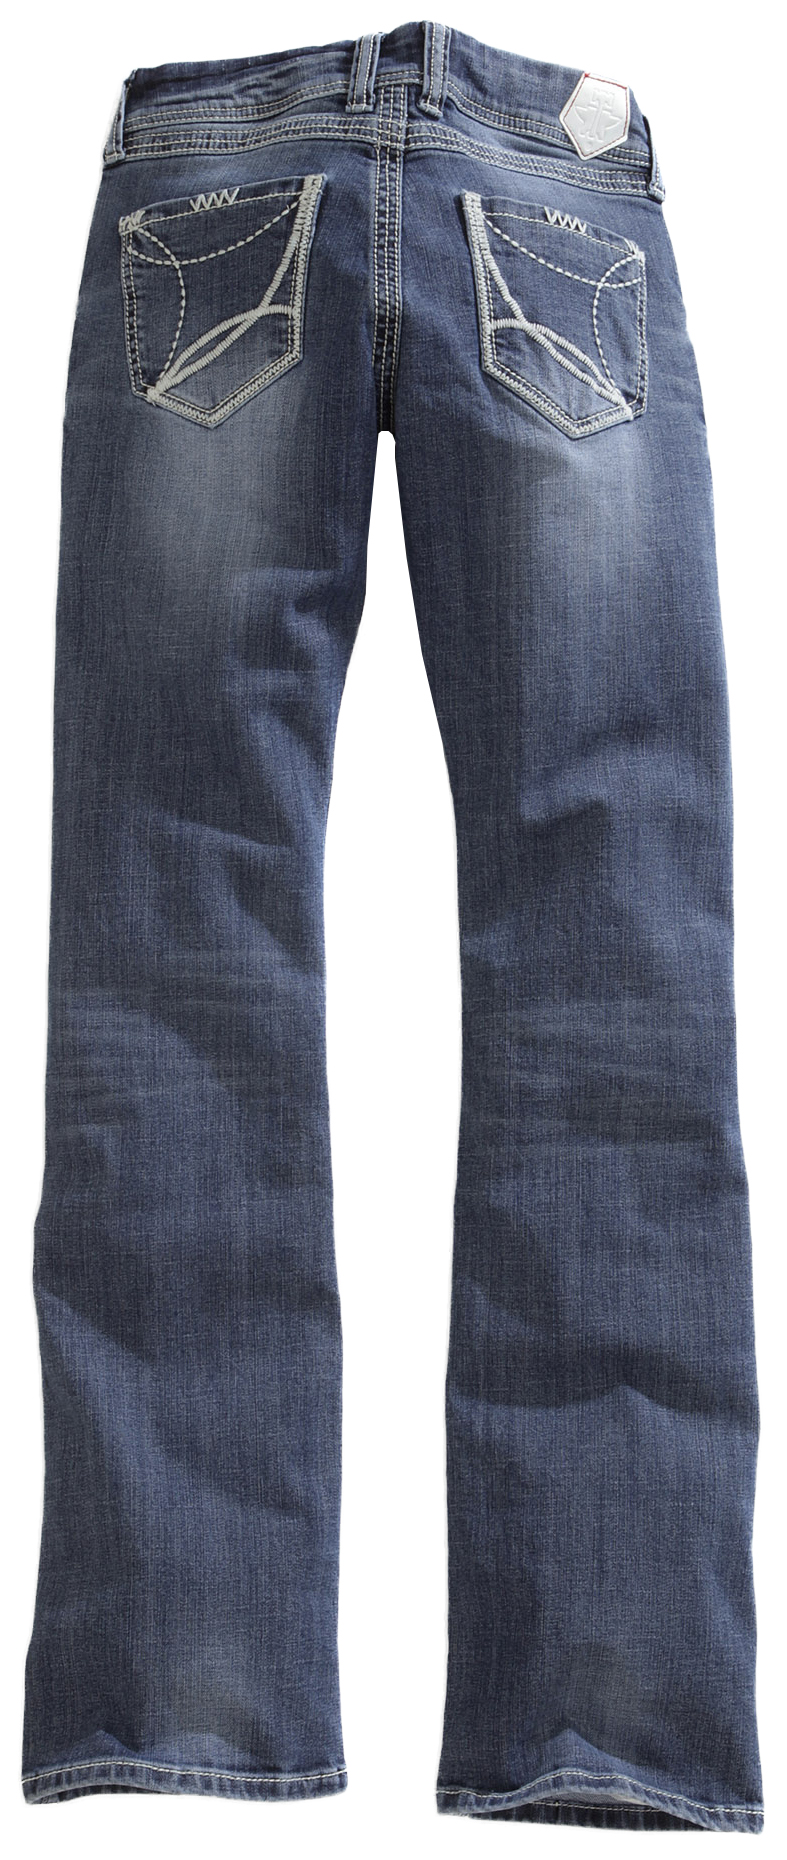 Tin Haul Jeans Womens